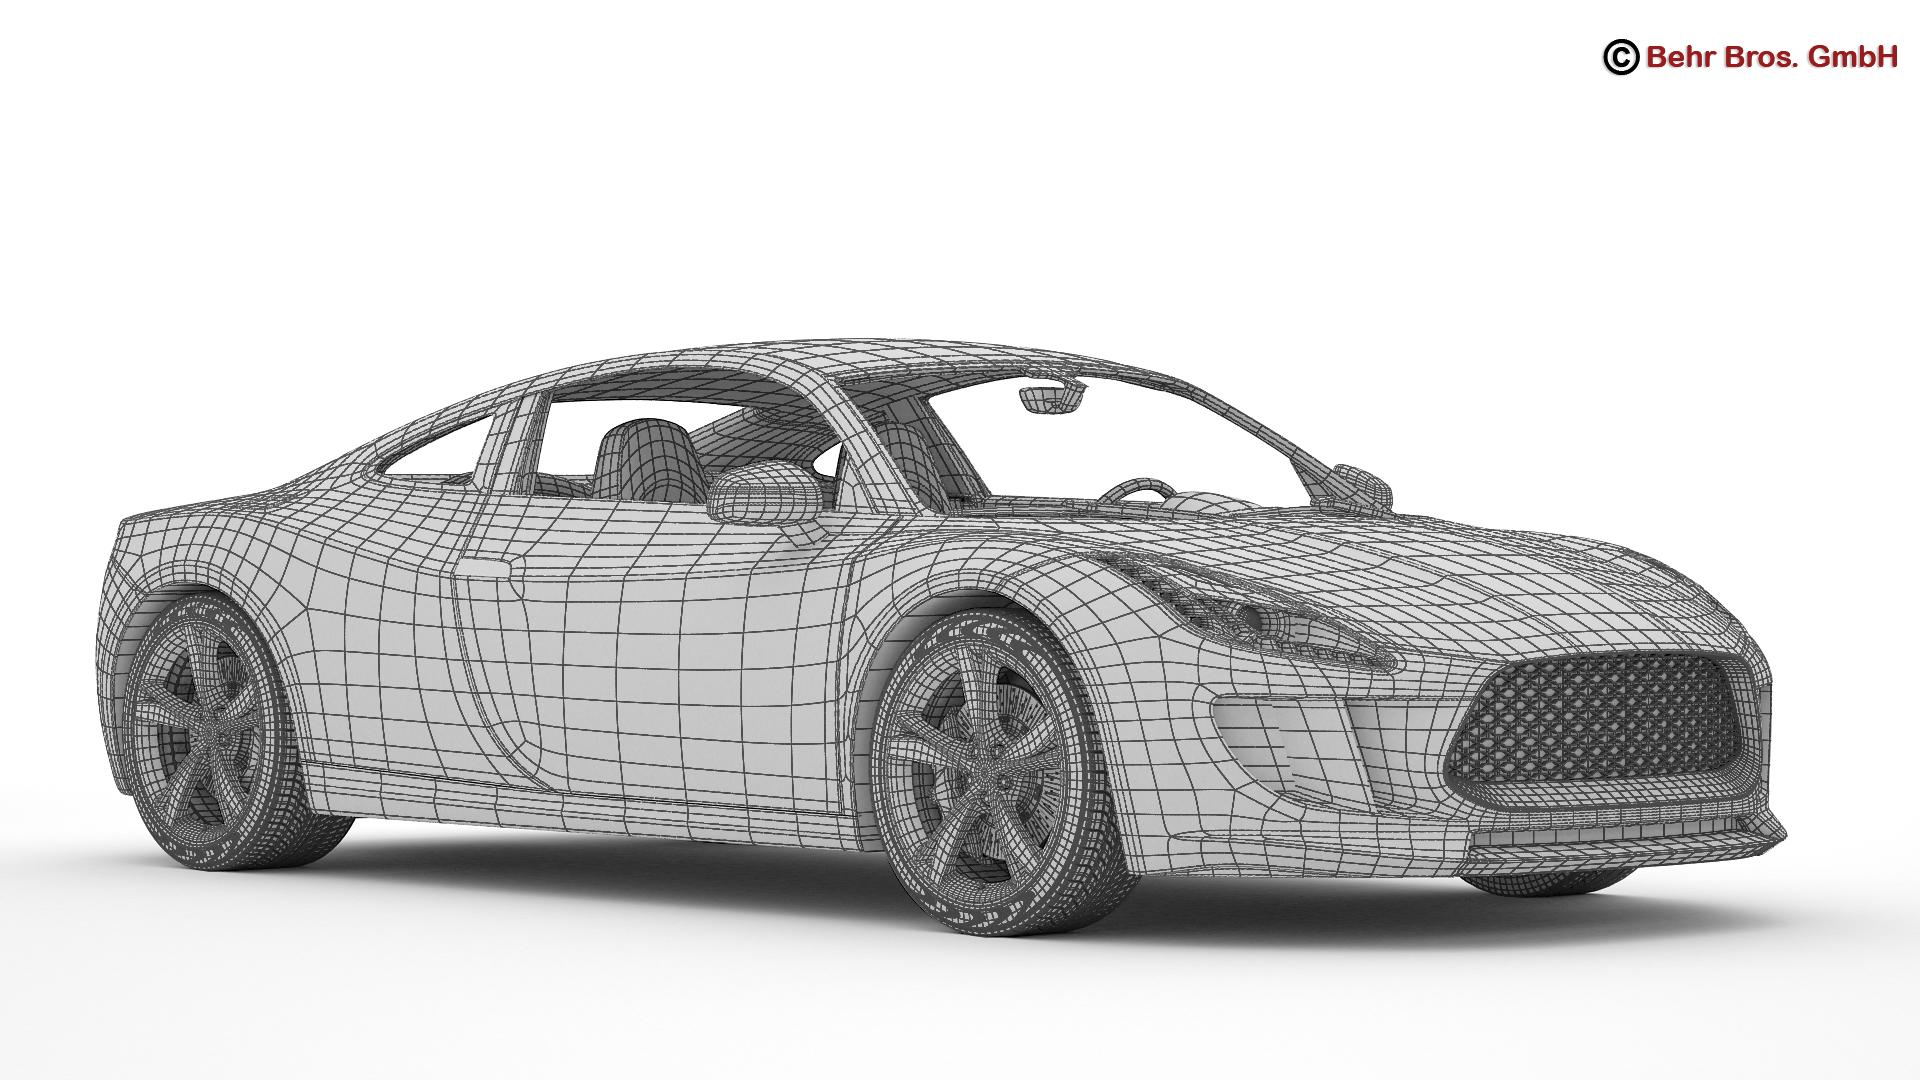 generic sports car 3d model 3ds max fbx c4d lwo ma mb obj 160540